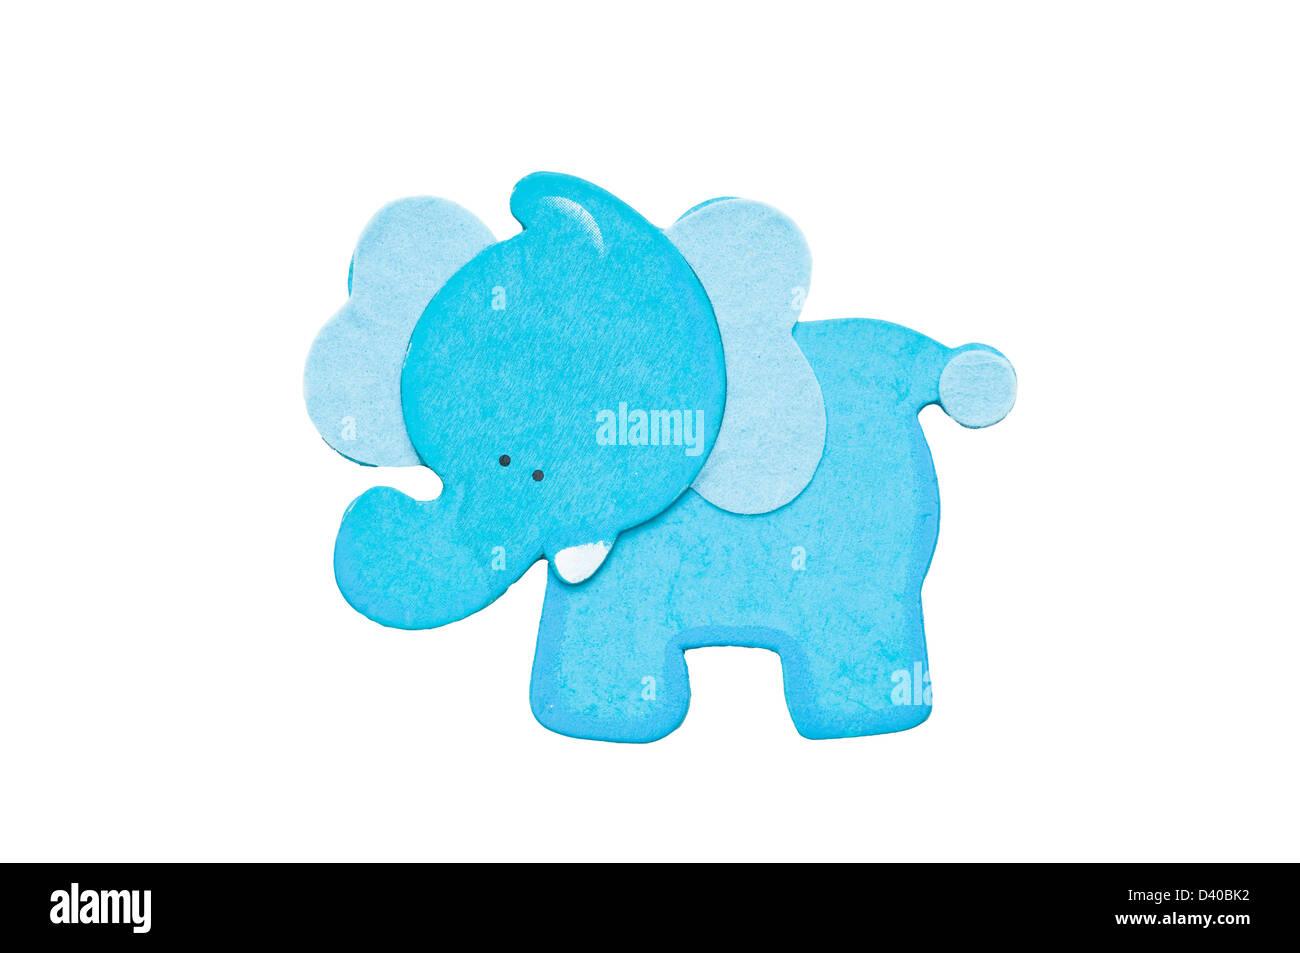 Blue Elephant en aislados Imagen De Stock